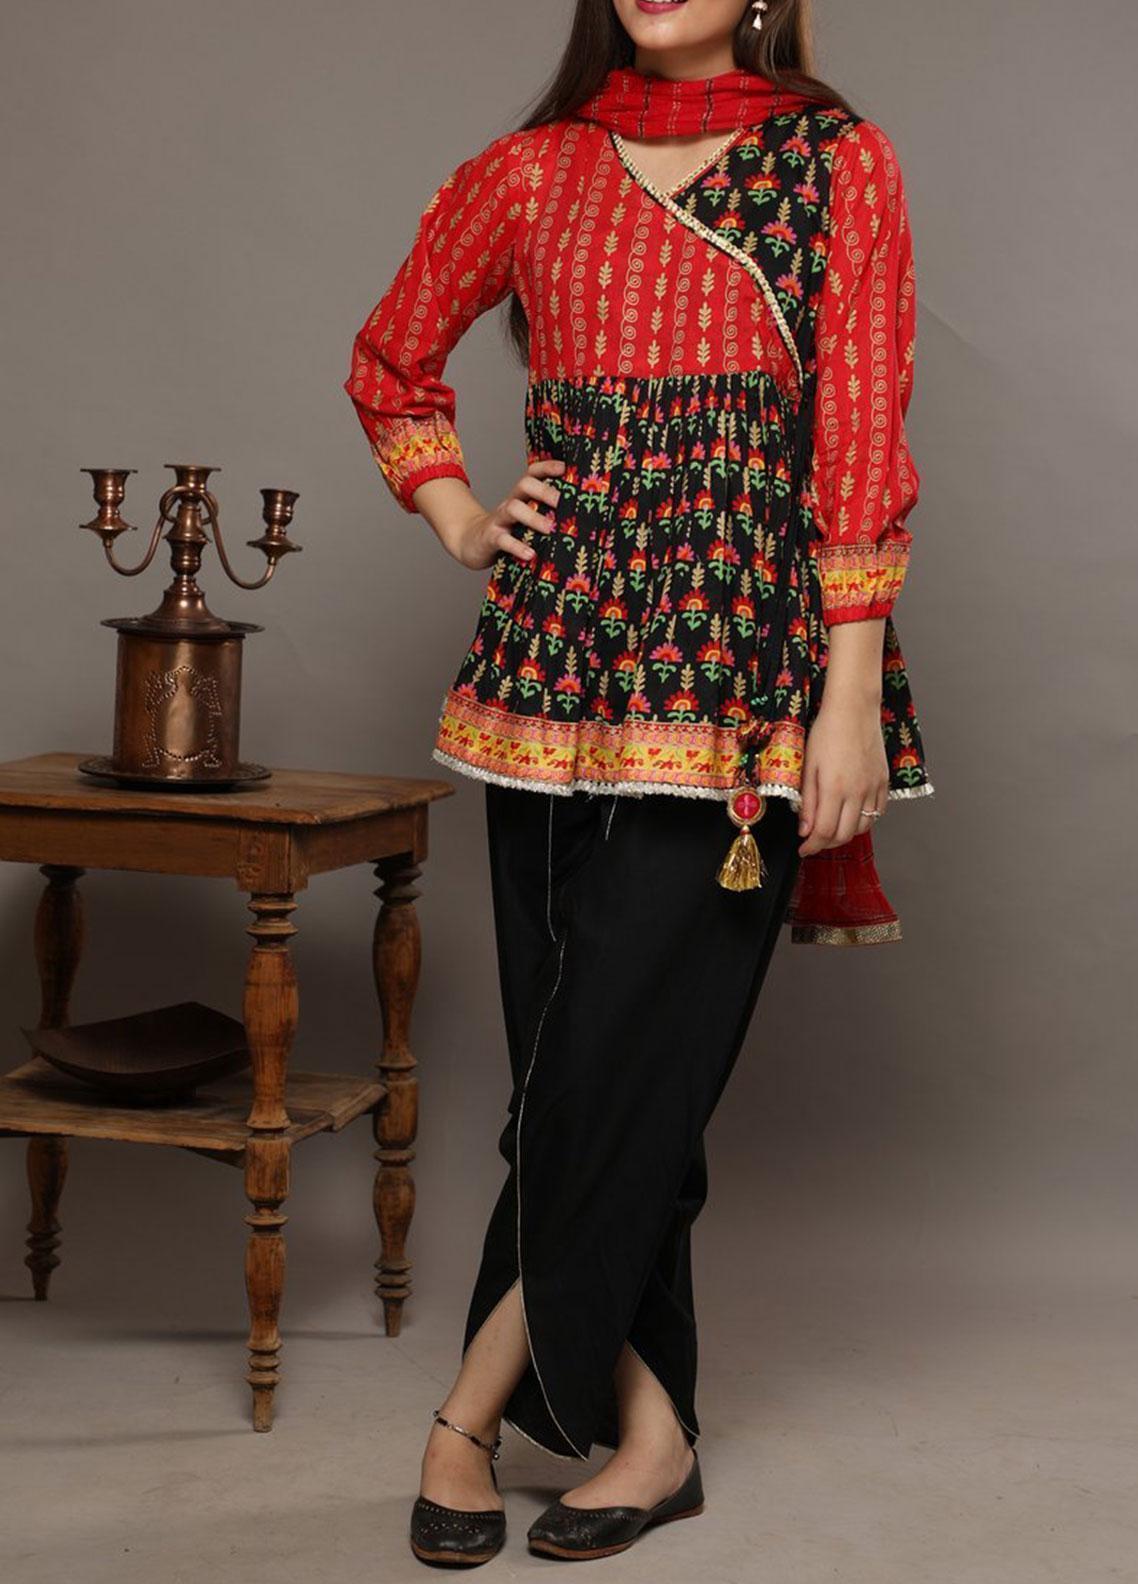 Senorita Lawn Casual 3 Piece Suit for Girls -  GBD-01550 RED/BLACK